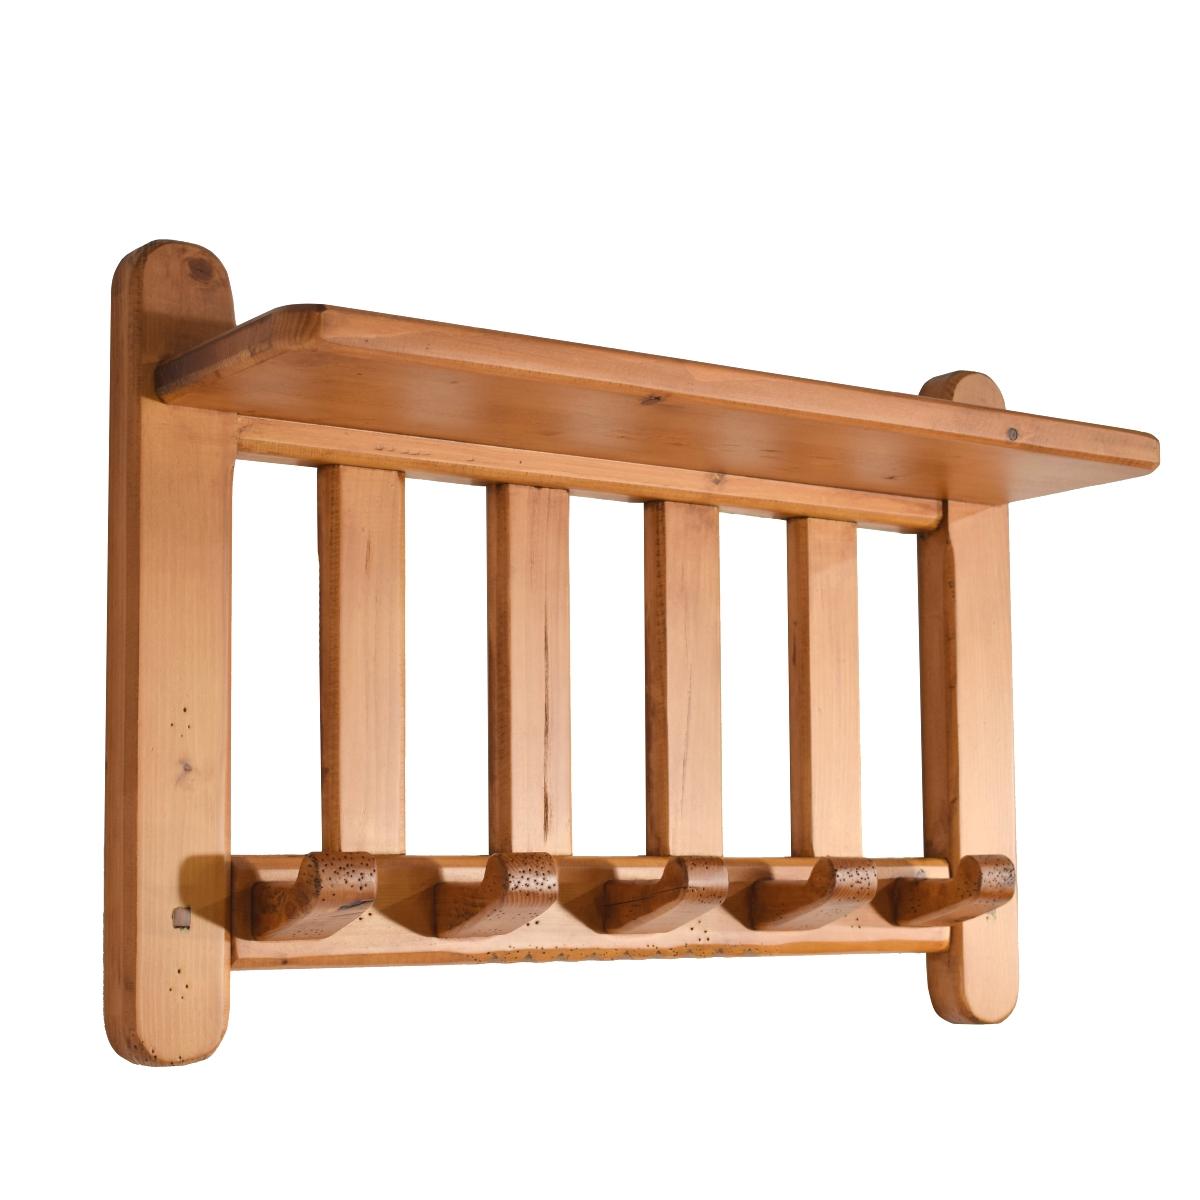 Perchero pared r stico de madera ecor stico venta de muebles - Percheros rusticos de pared ...